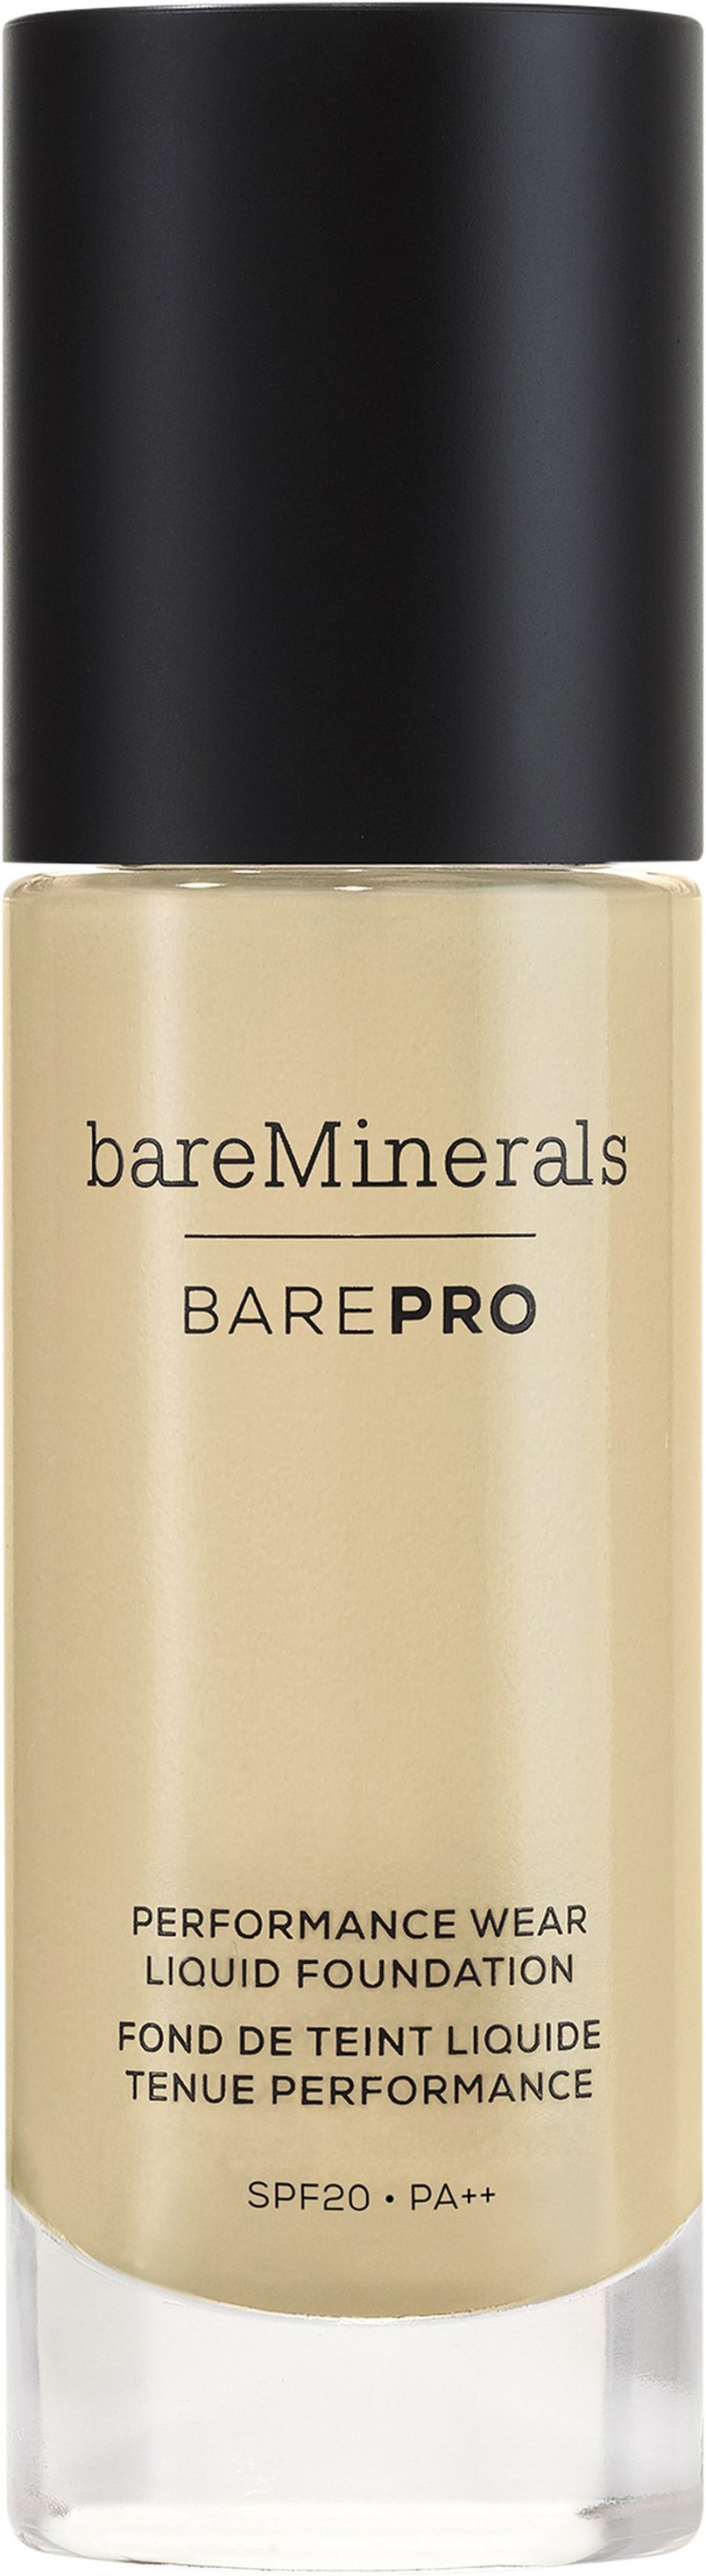 Image of   Bareminerals Foundation - Barepro Performance Wear Liquid - Golden Nude 13